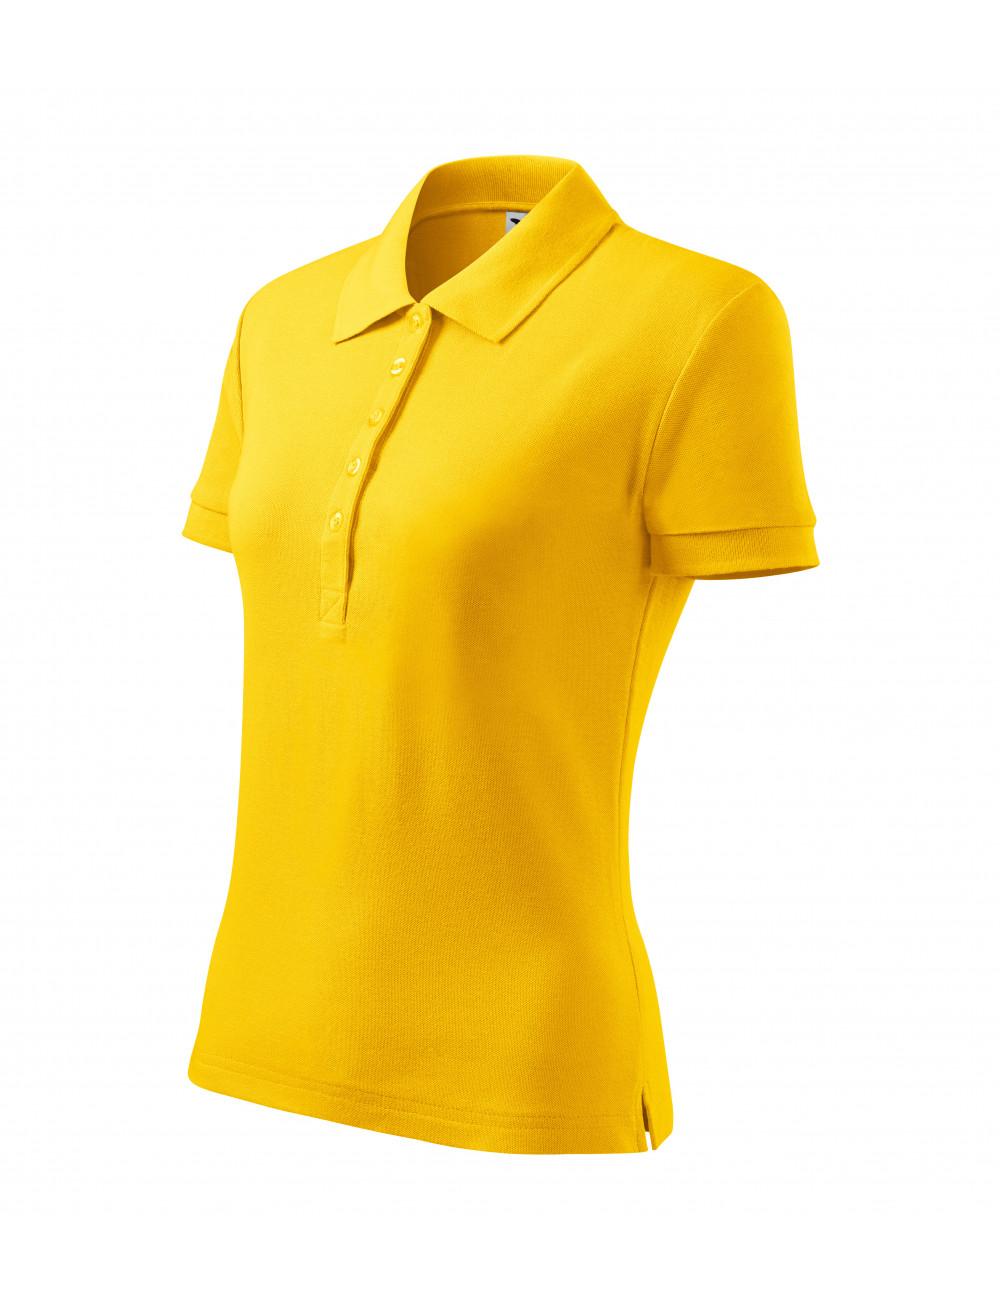 Adler MALFINI Koszulka polo damska Cotton Heavy 216 żółty